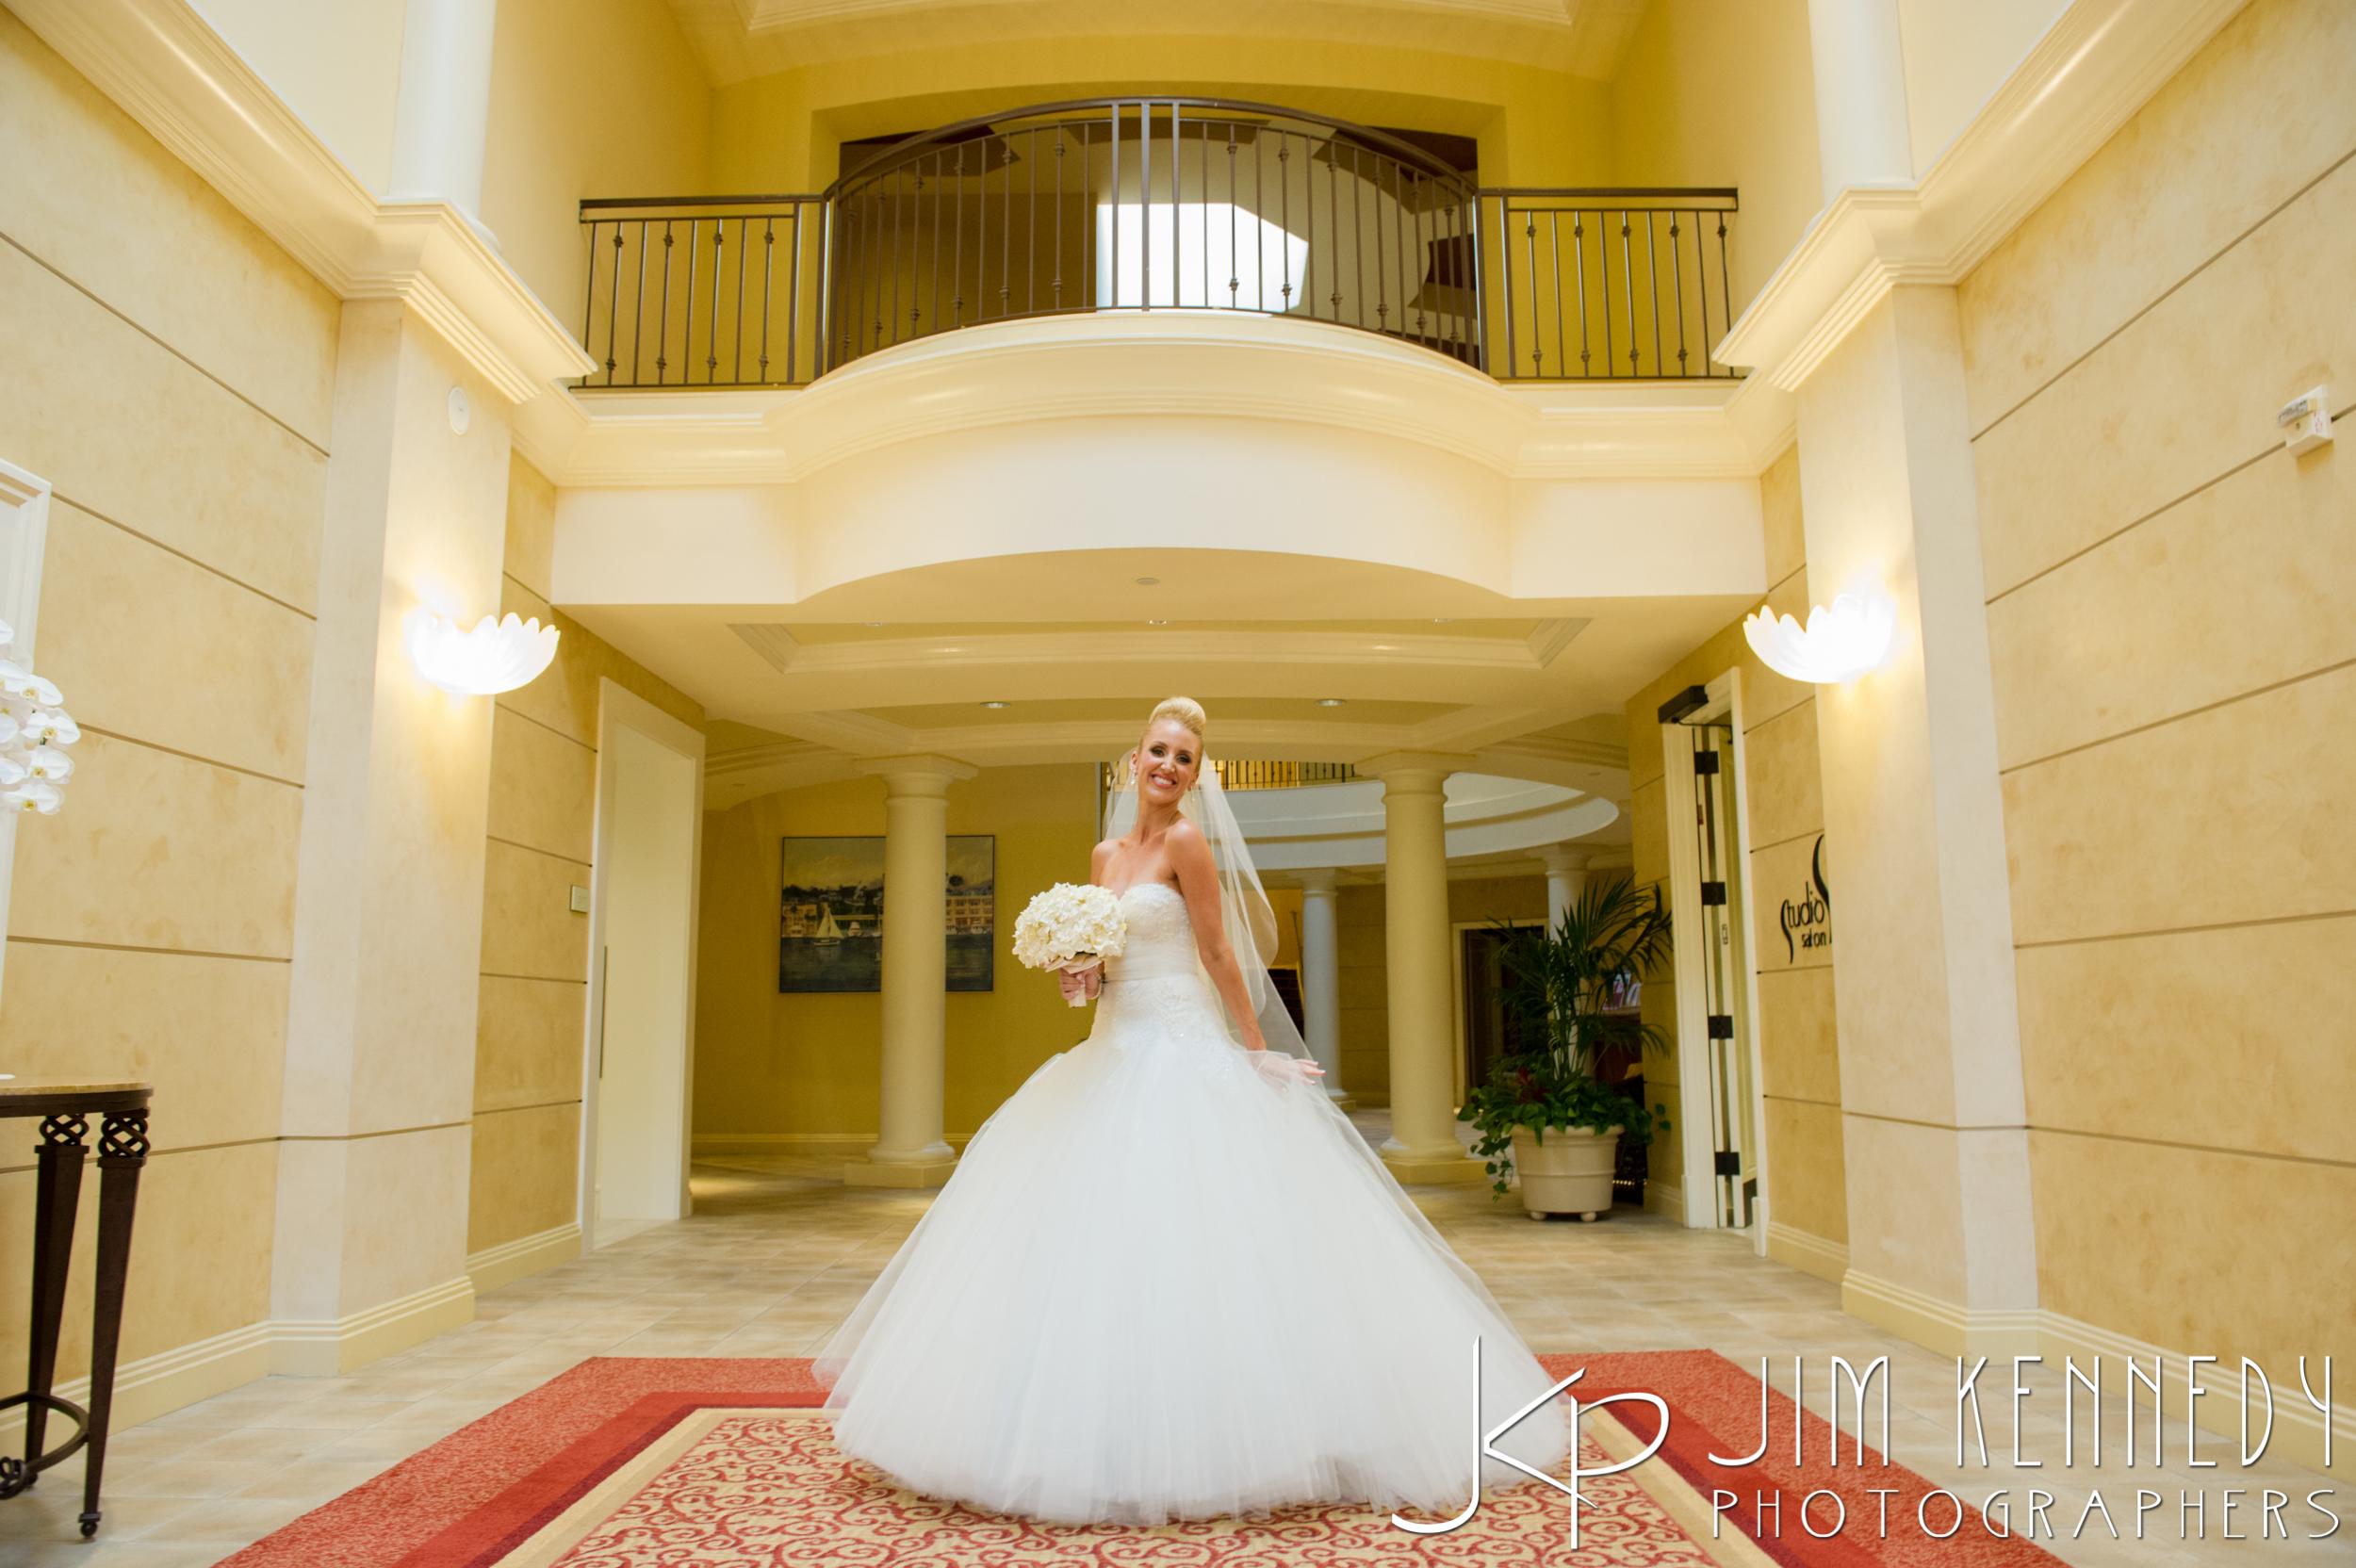 balboa-bay-resort-wedding-photography_0060.JPG